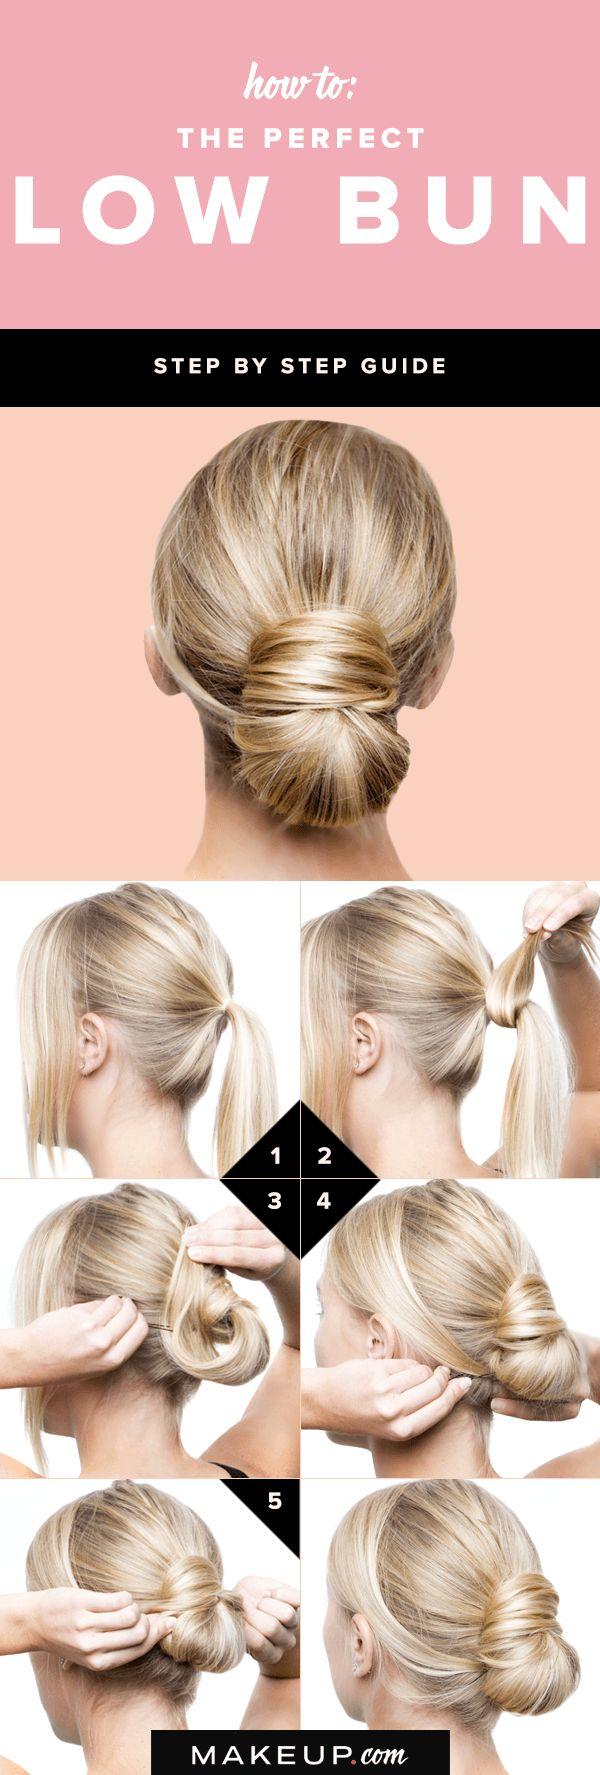 Miraculous 1000 Ideas About Low Bun Tutorials On Pinterest Bun Tutorials Hairstyle Inspiration Daily Dogsangcom